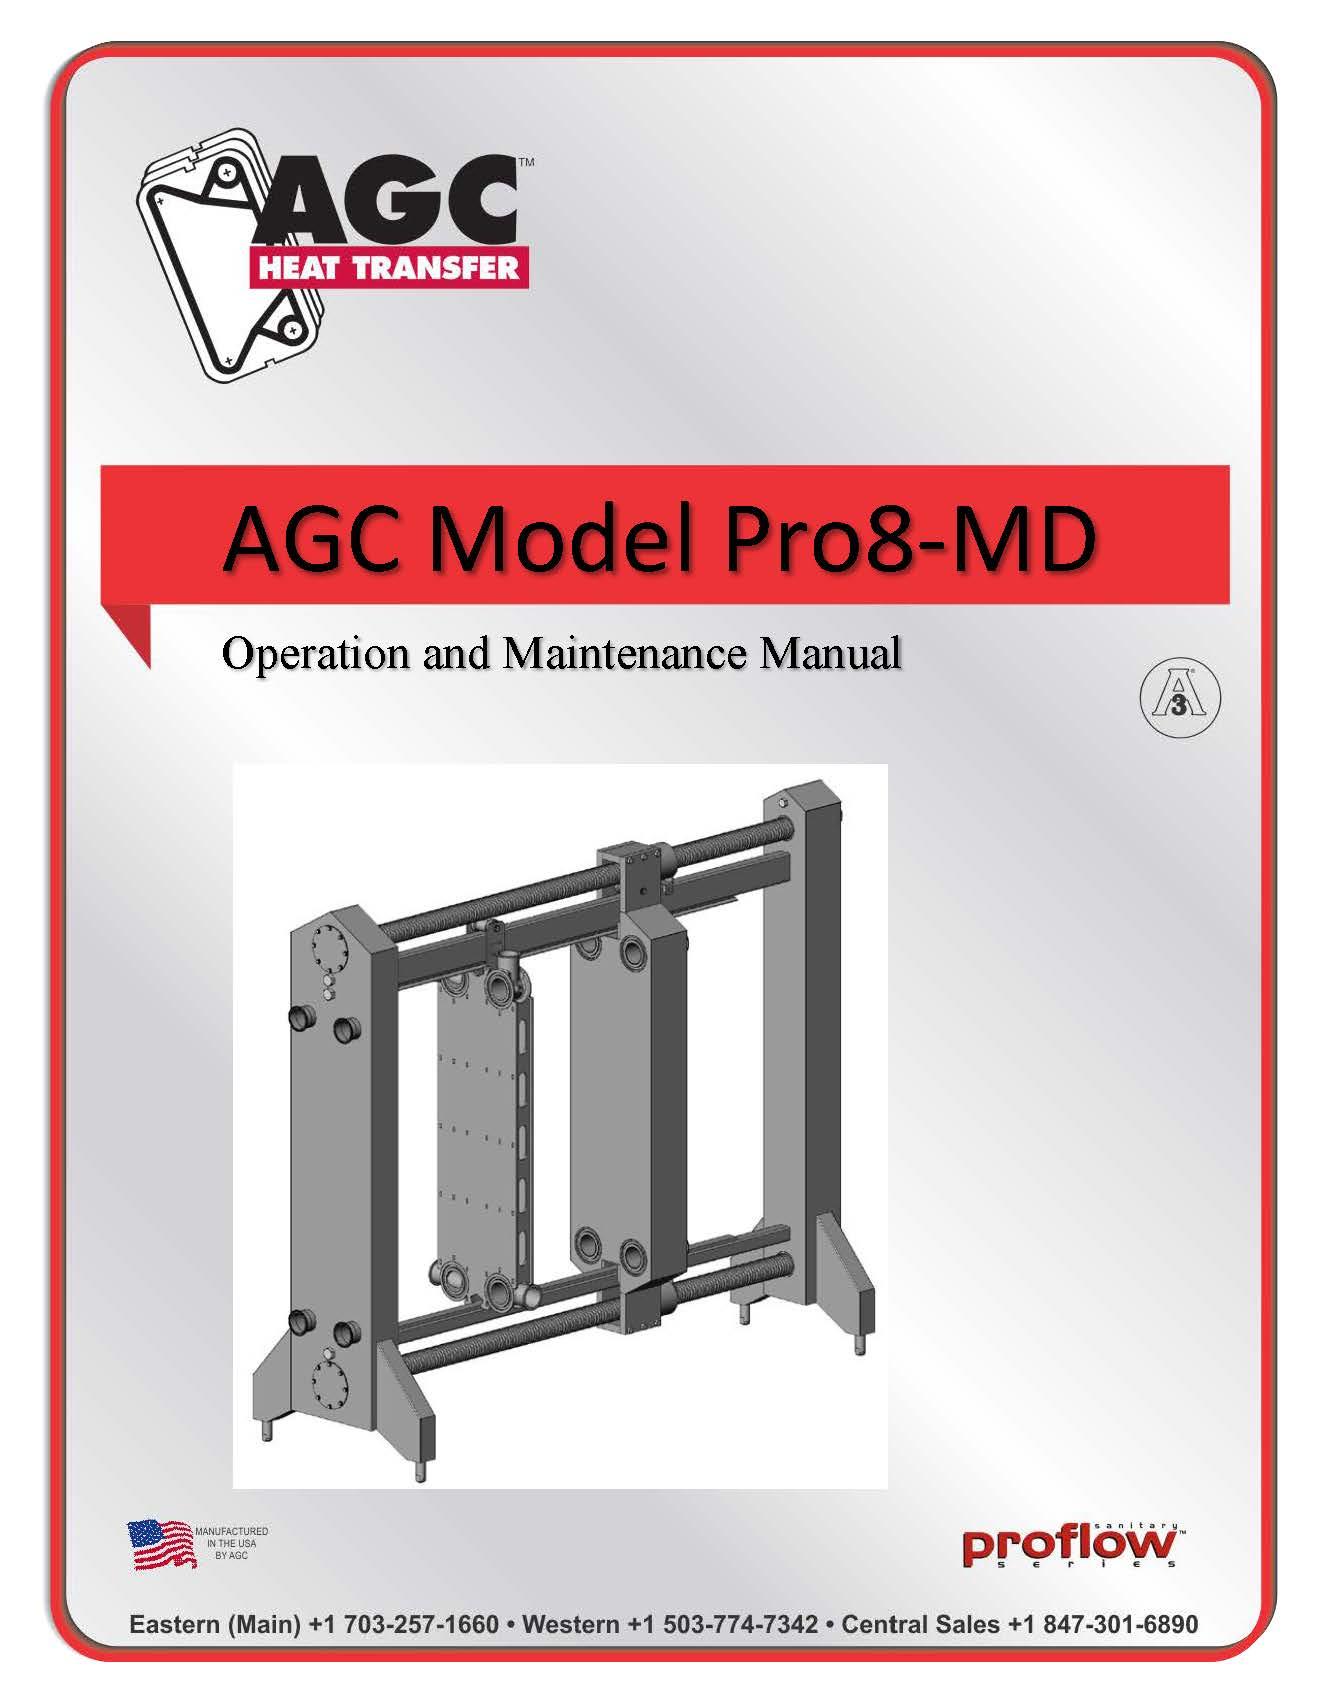 AGC Operating Manual Pro8-MD